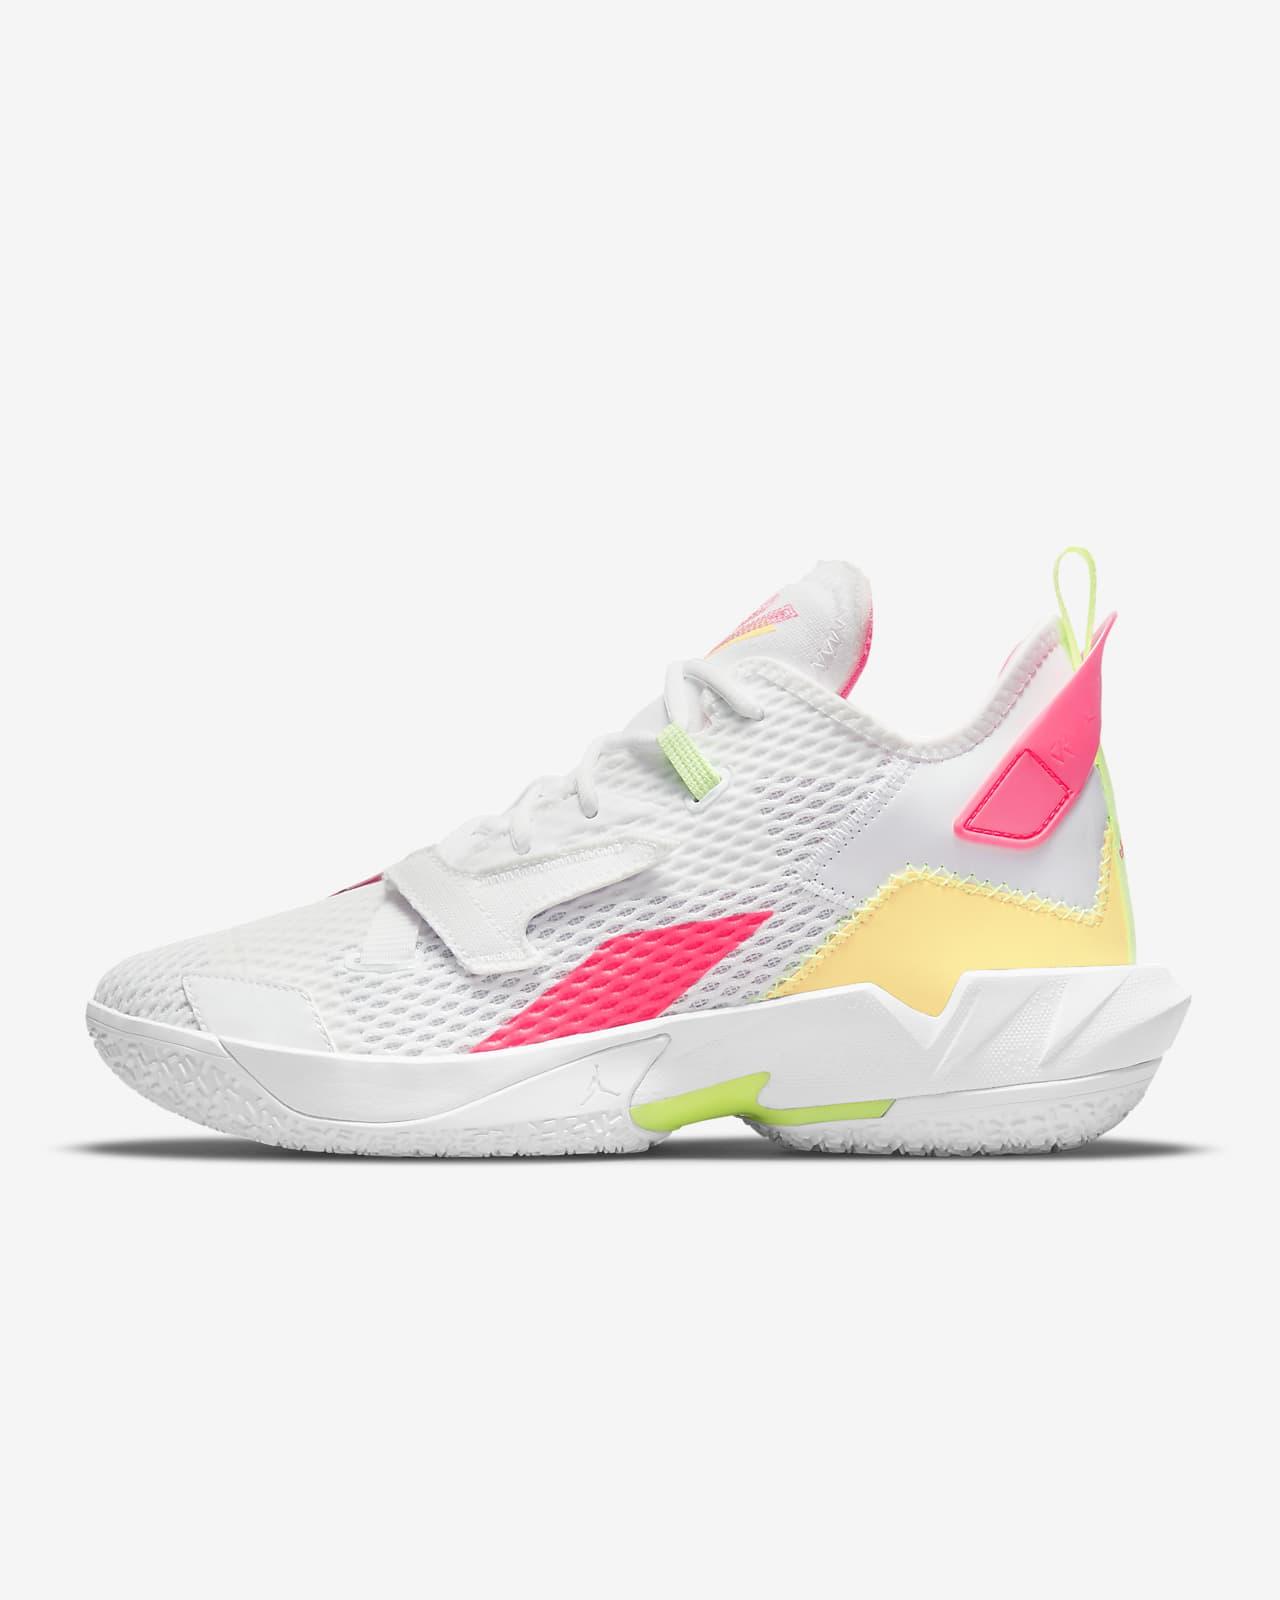 Jordan Why Not? Zer0.4 PF 籃球鞋